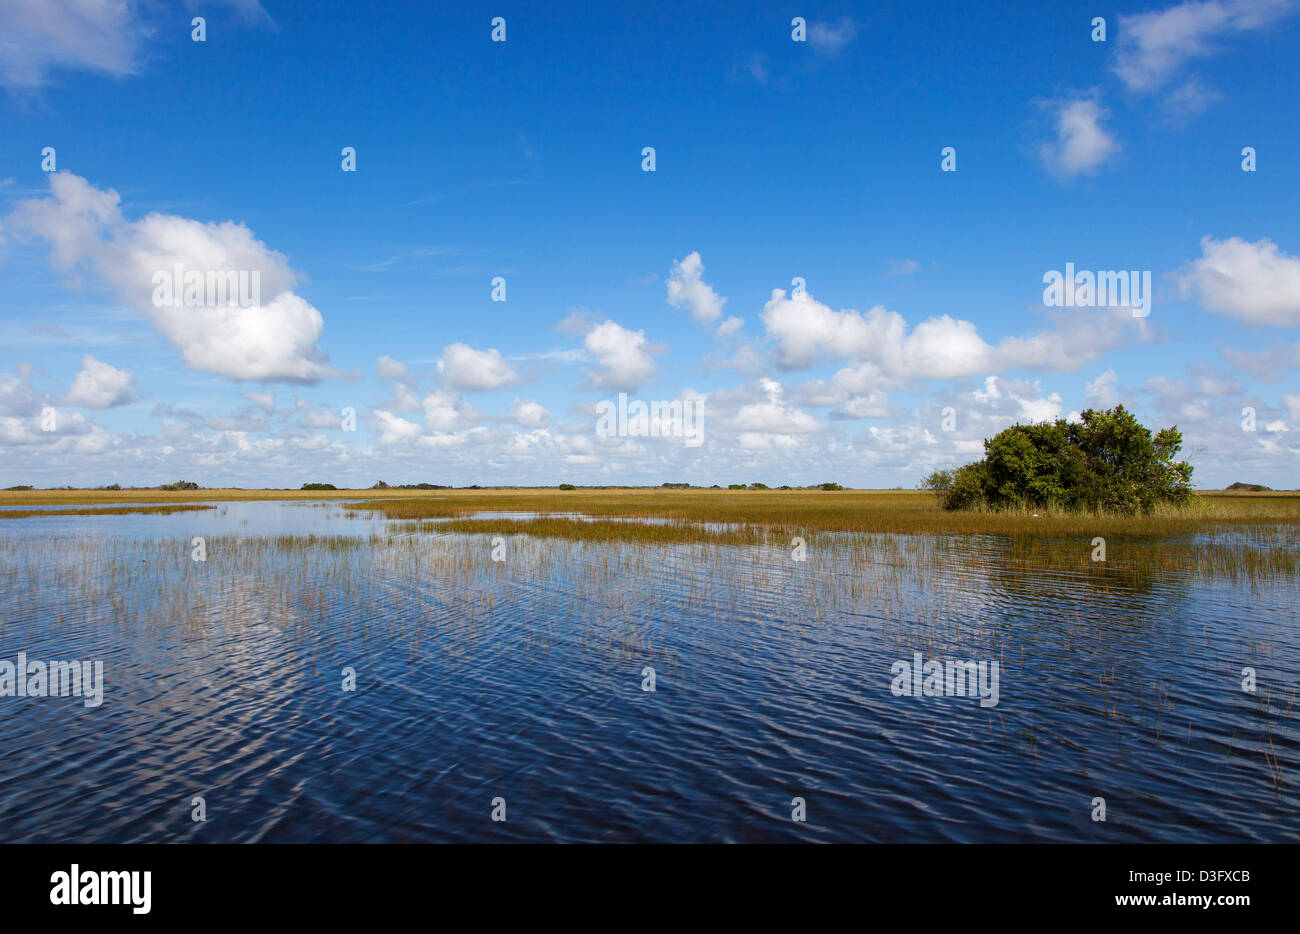 The Everglades, Florida, USA - Stock Image